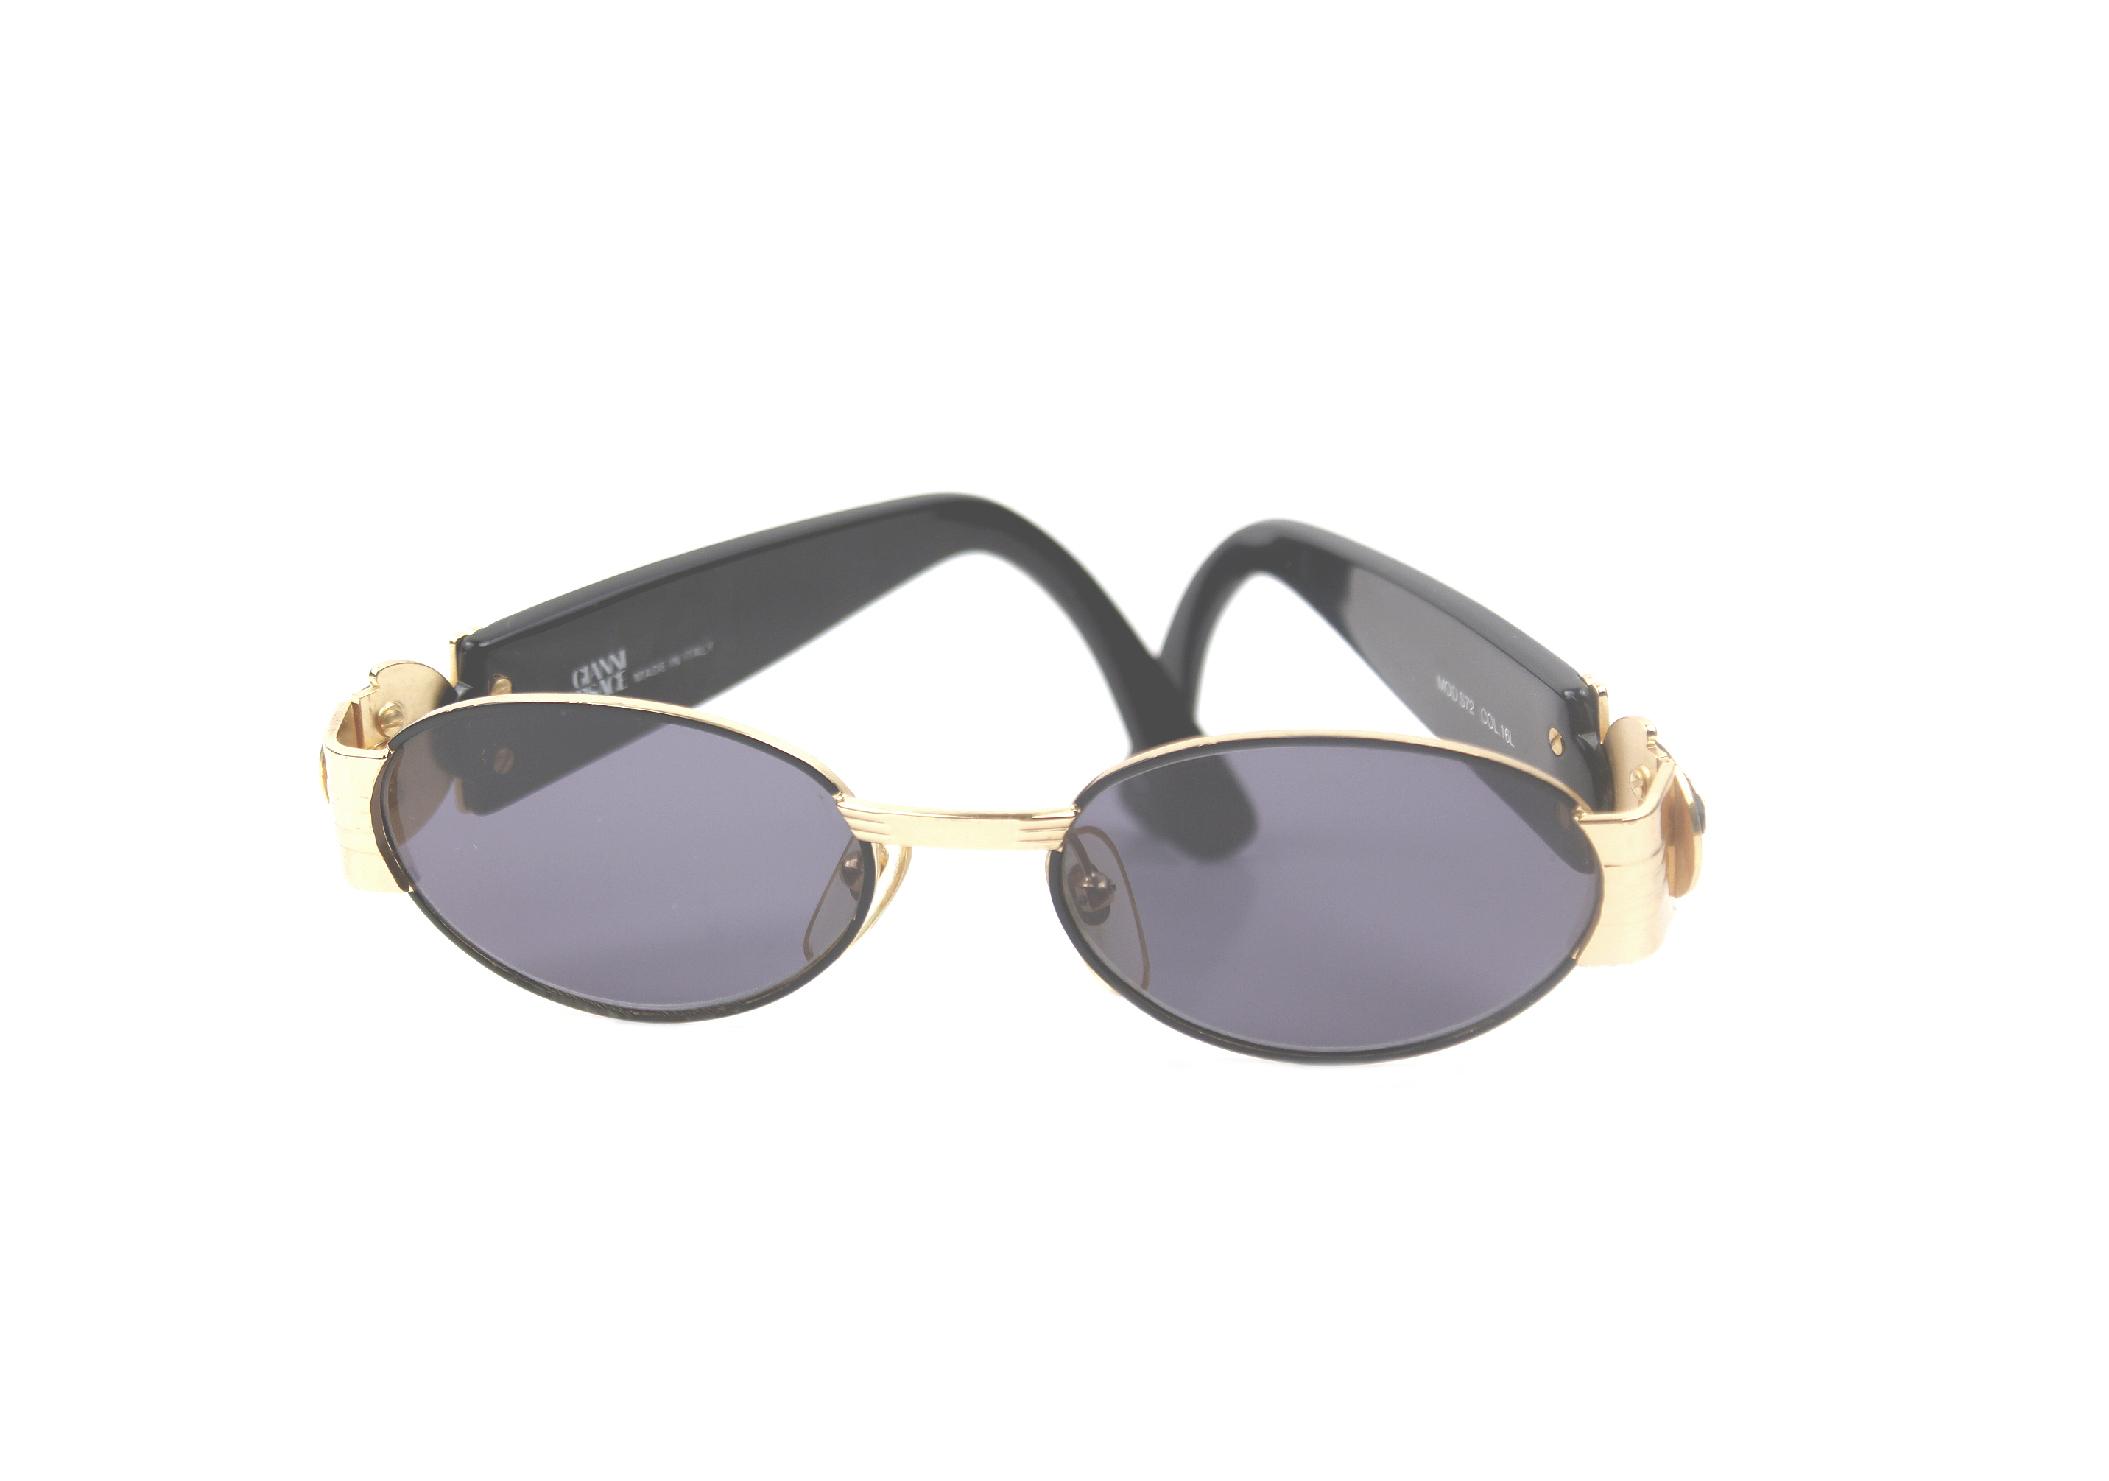 c57601907e558 vintage Gianni Versace medusa black sunglasses 01 rare Gianni Versace gold  medusa black vintage sunglasses ...